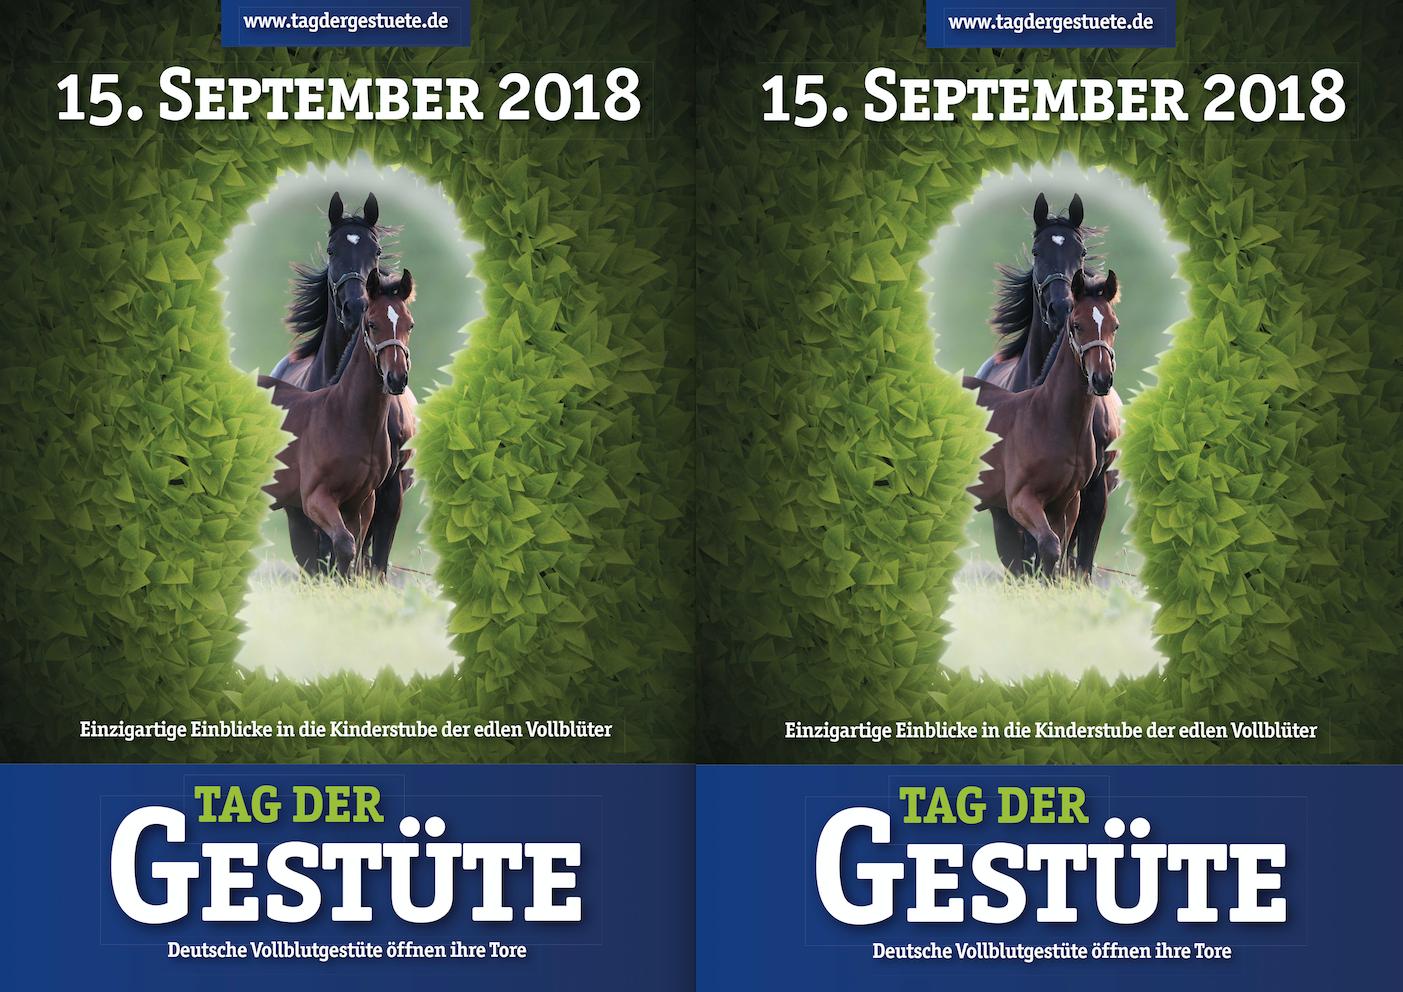 15. September: Zu Gast bei edlen Vollblütern